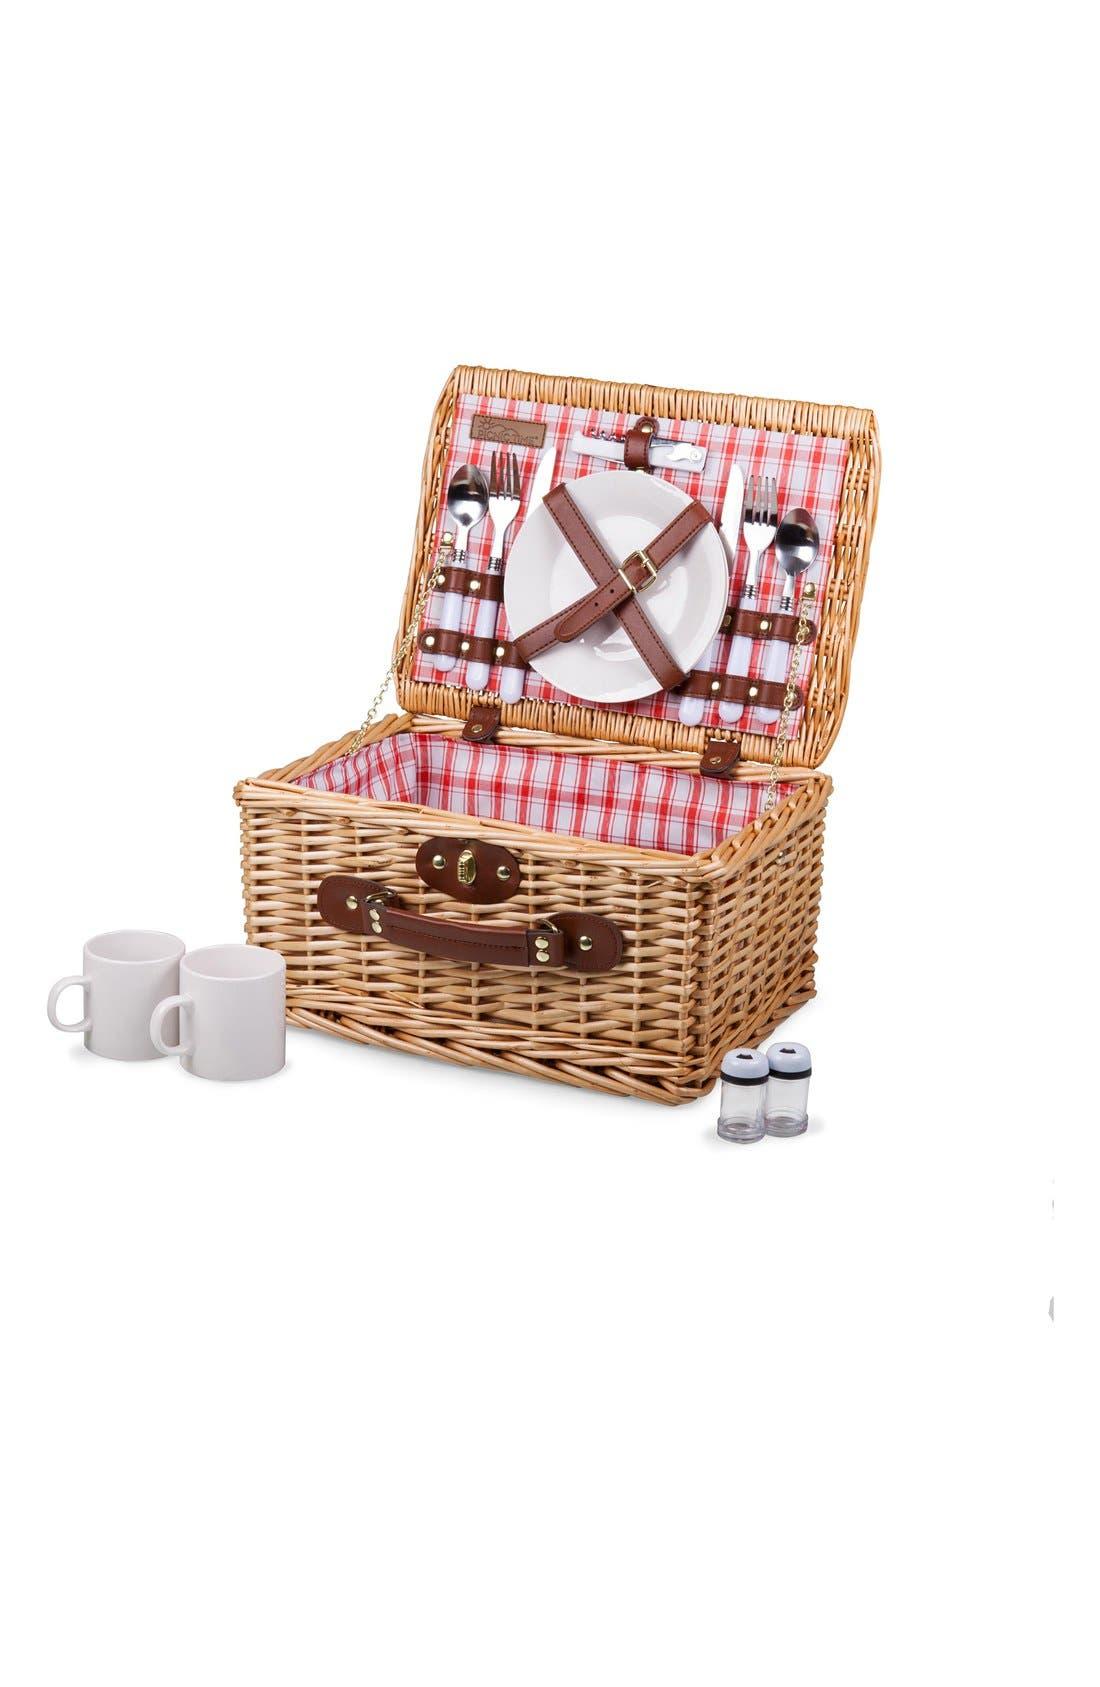 Main Image - Picnic Time 'Catalina' Wicker Picnic Basket